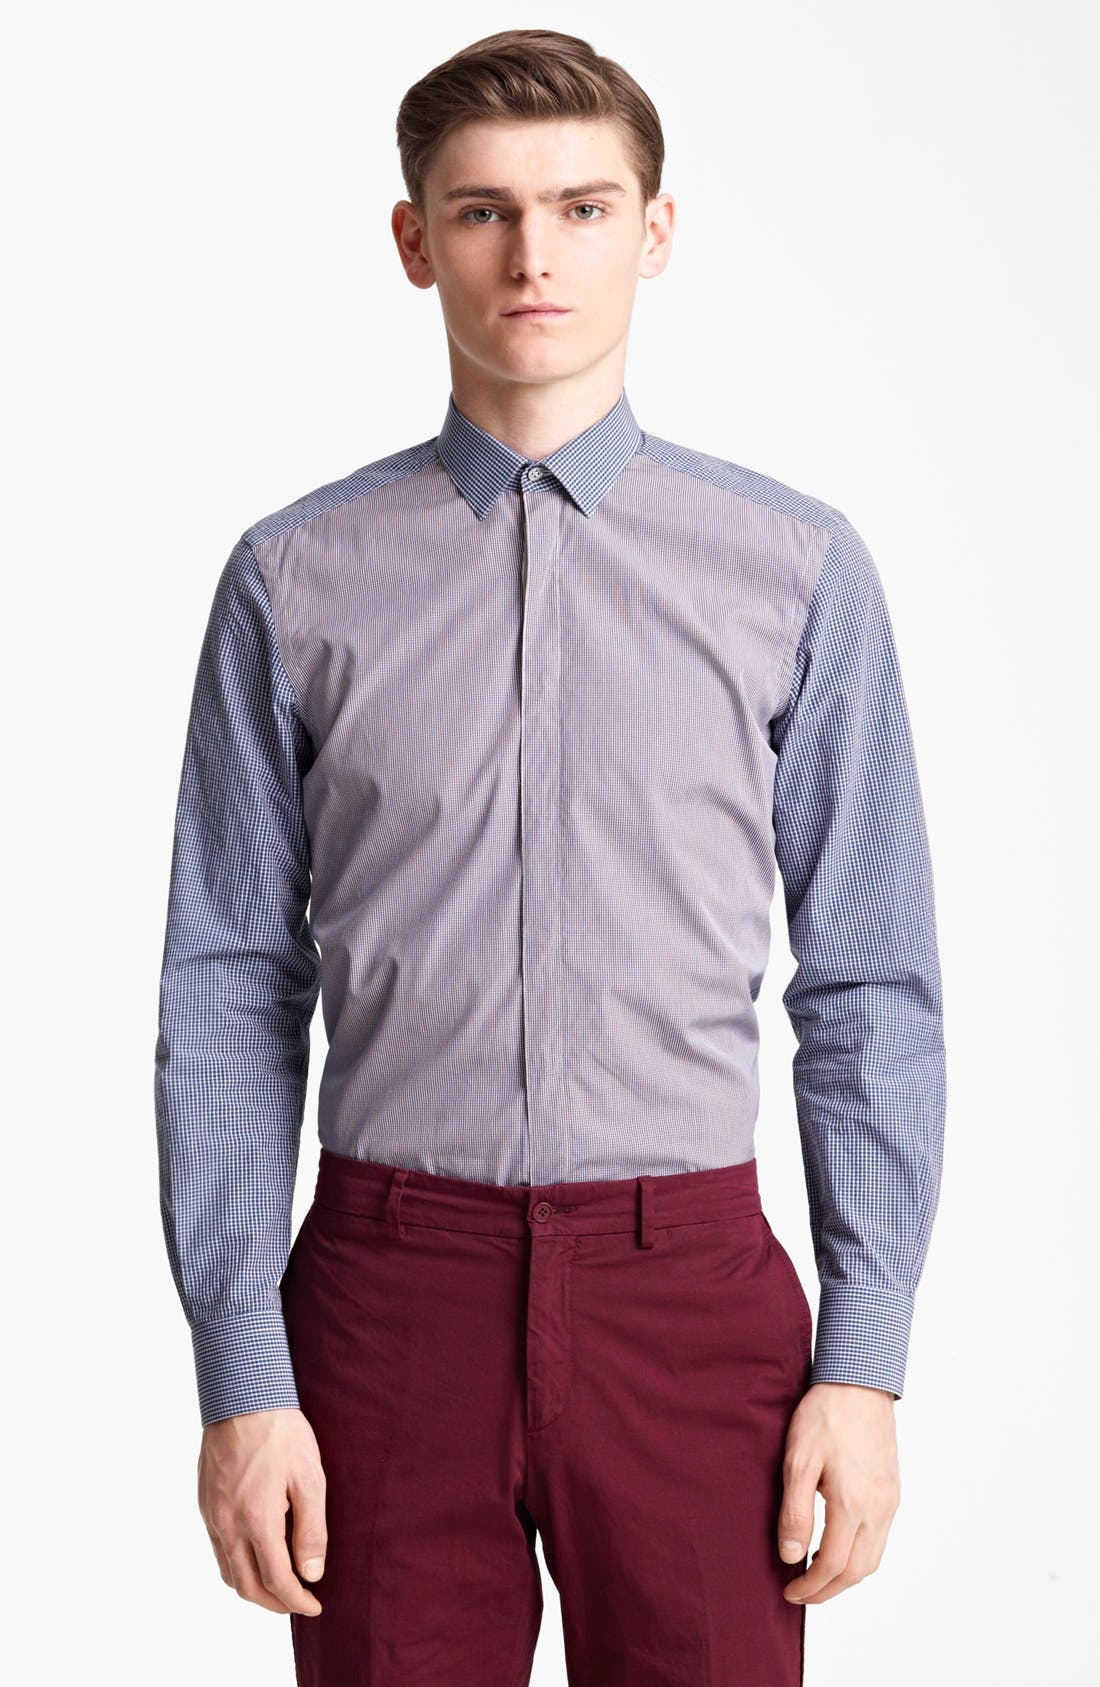 Main Image - Lanvin Two-Tone Check Dress Shirt